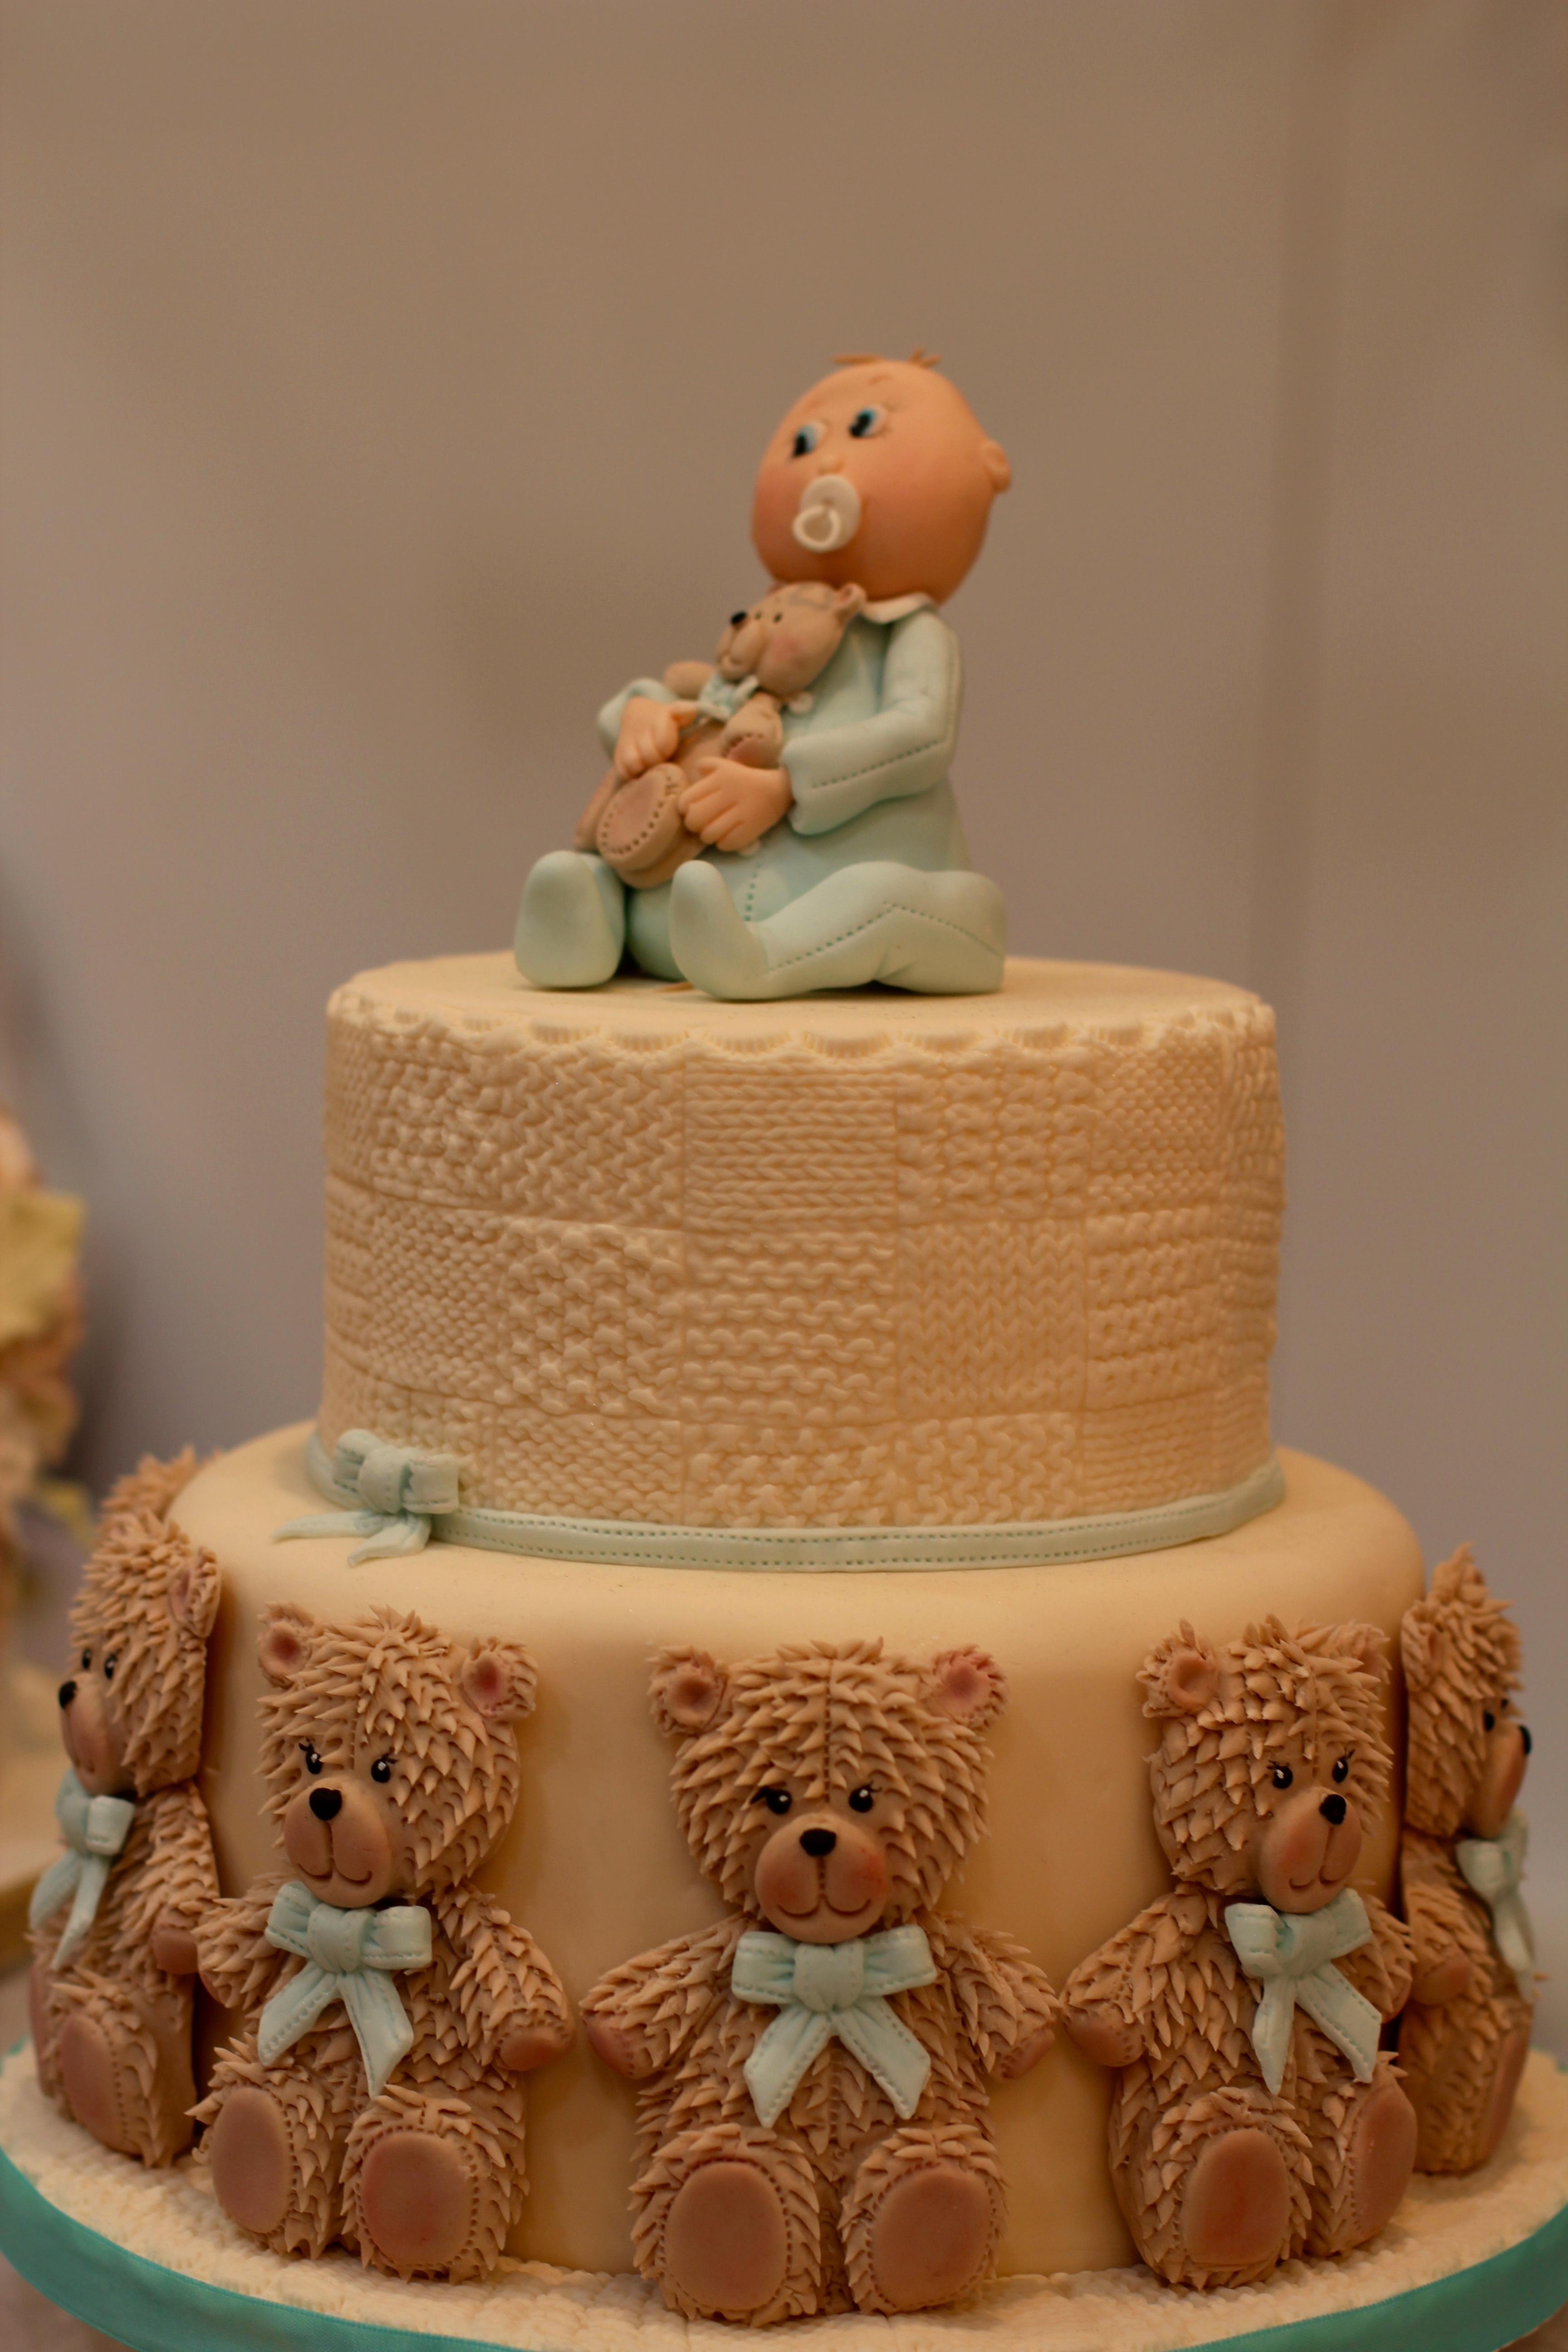 Bear Food Dessert Cake Happy Birthday Teddy Icing Pastry Shop Wedding